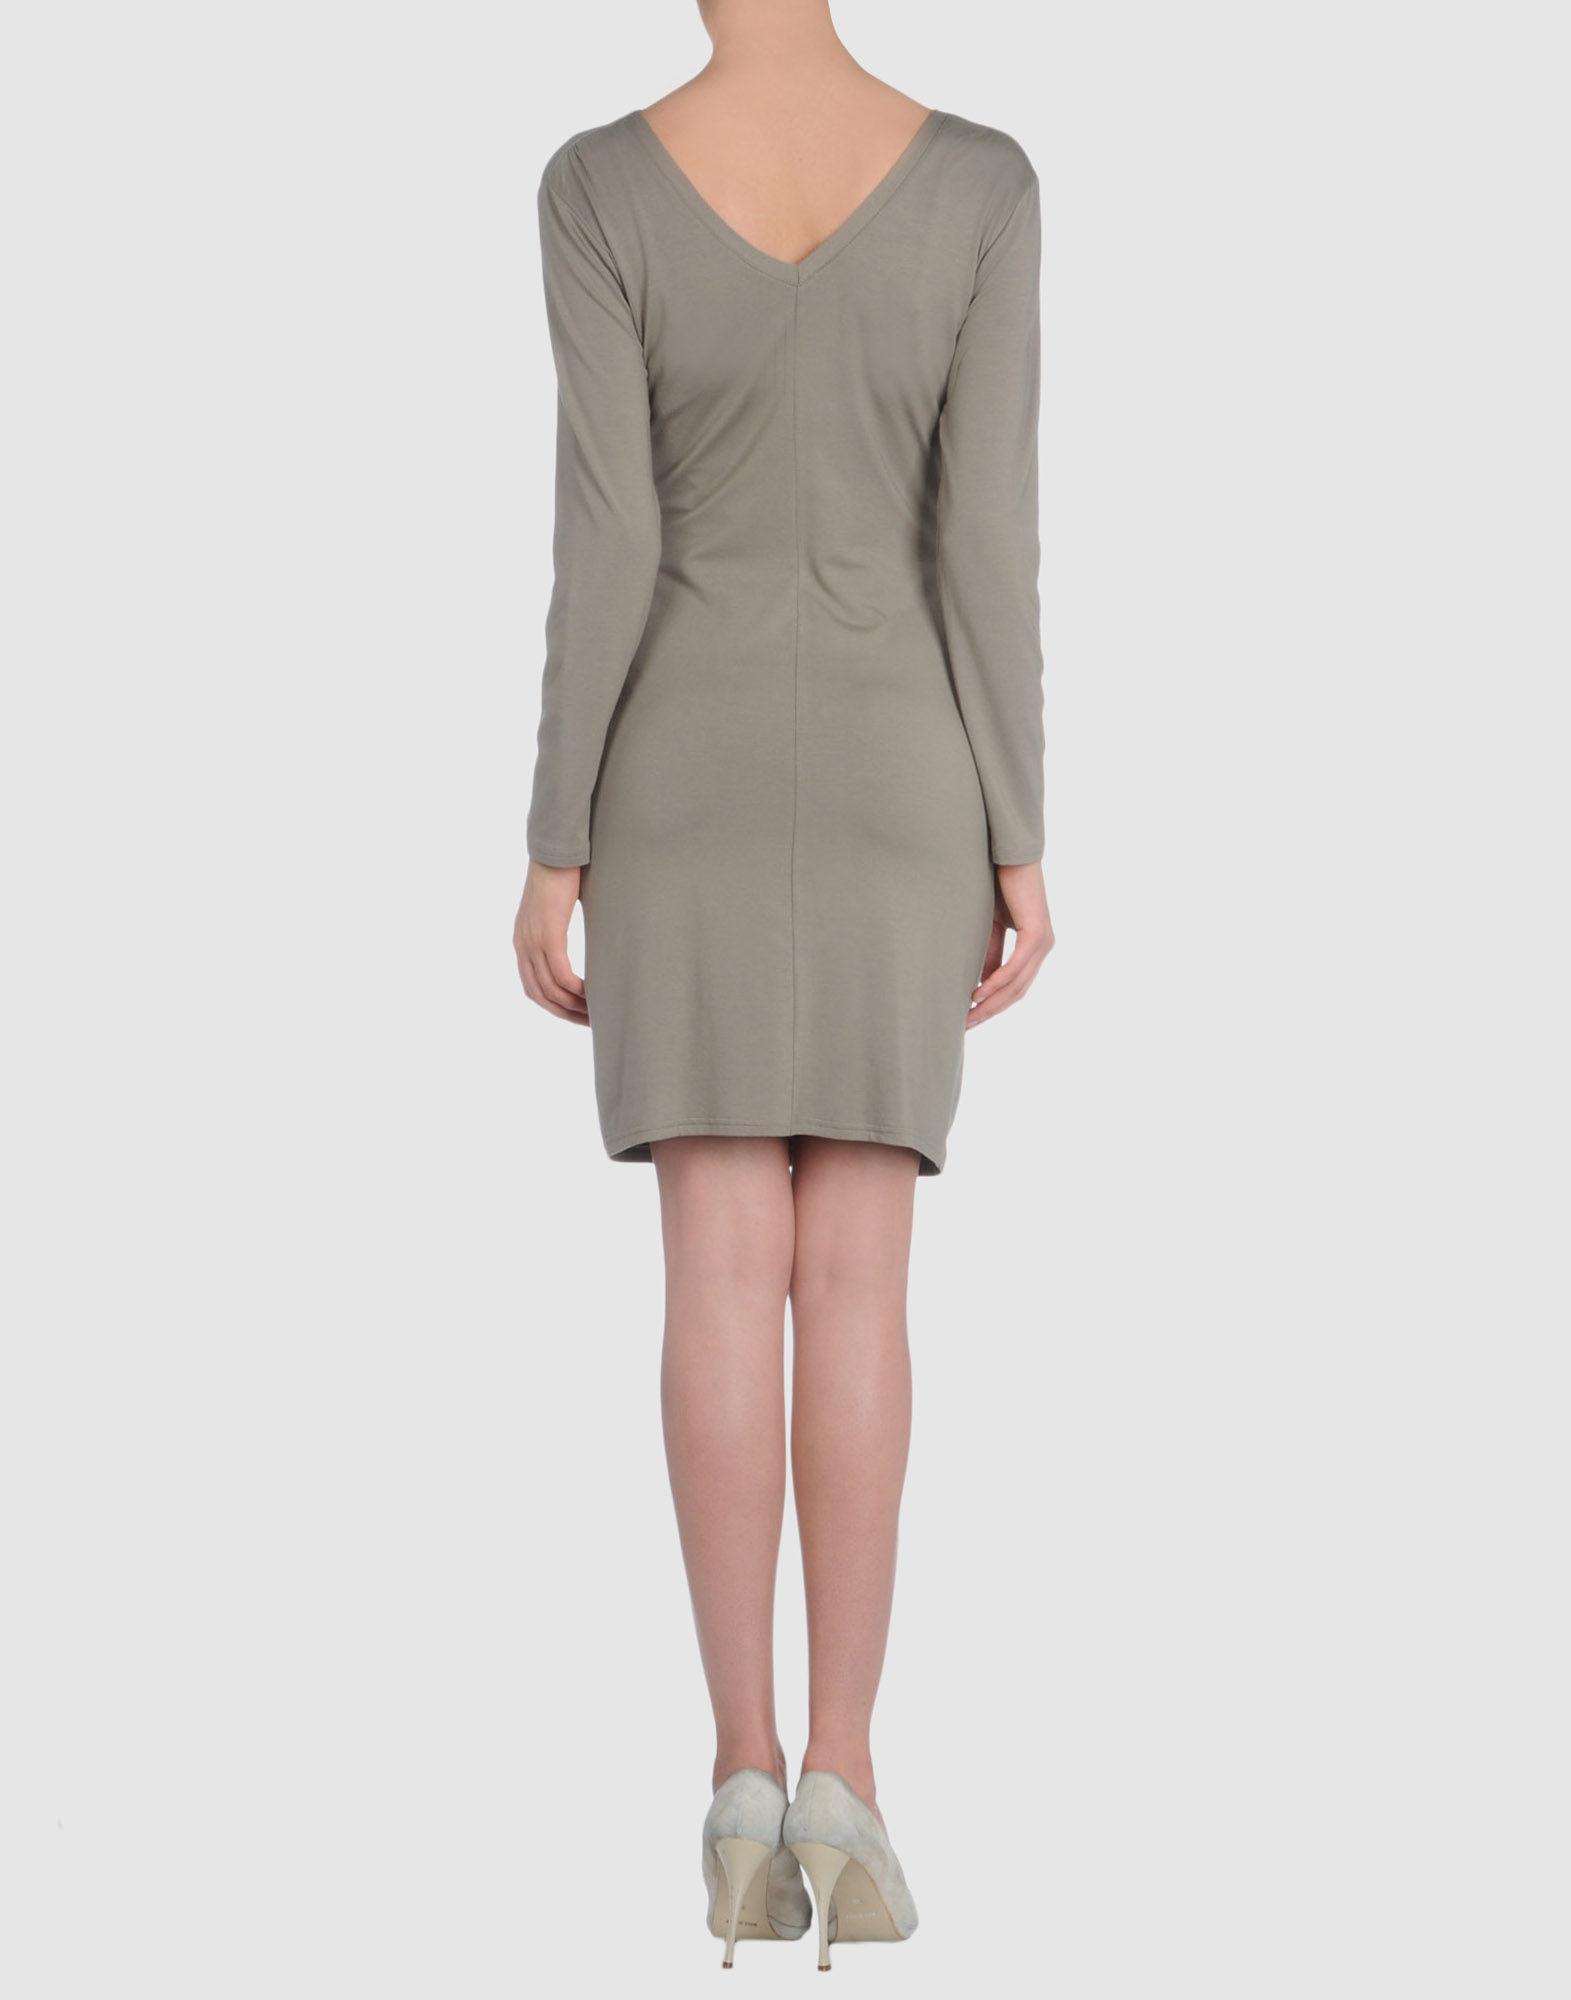 34208052XJ 14 r - Evening Φορεματα Victoria Coleman Κωδ.06